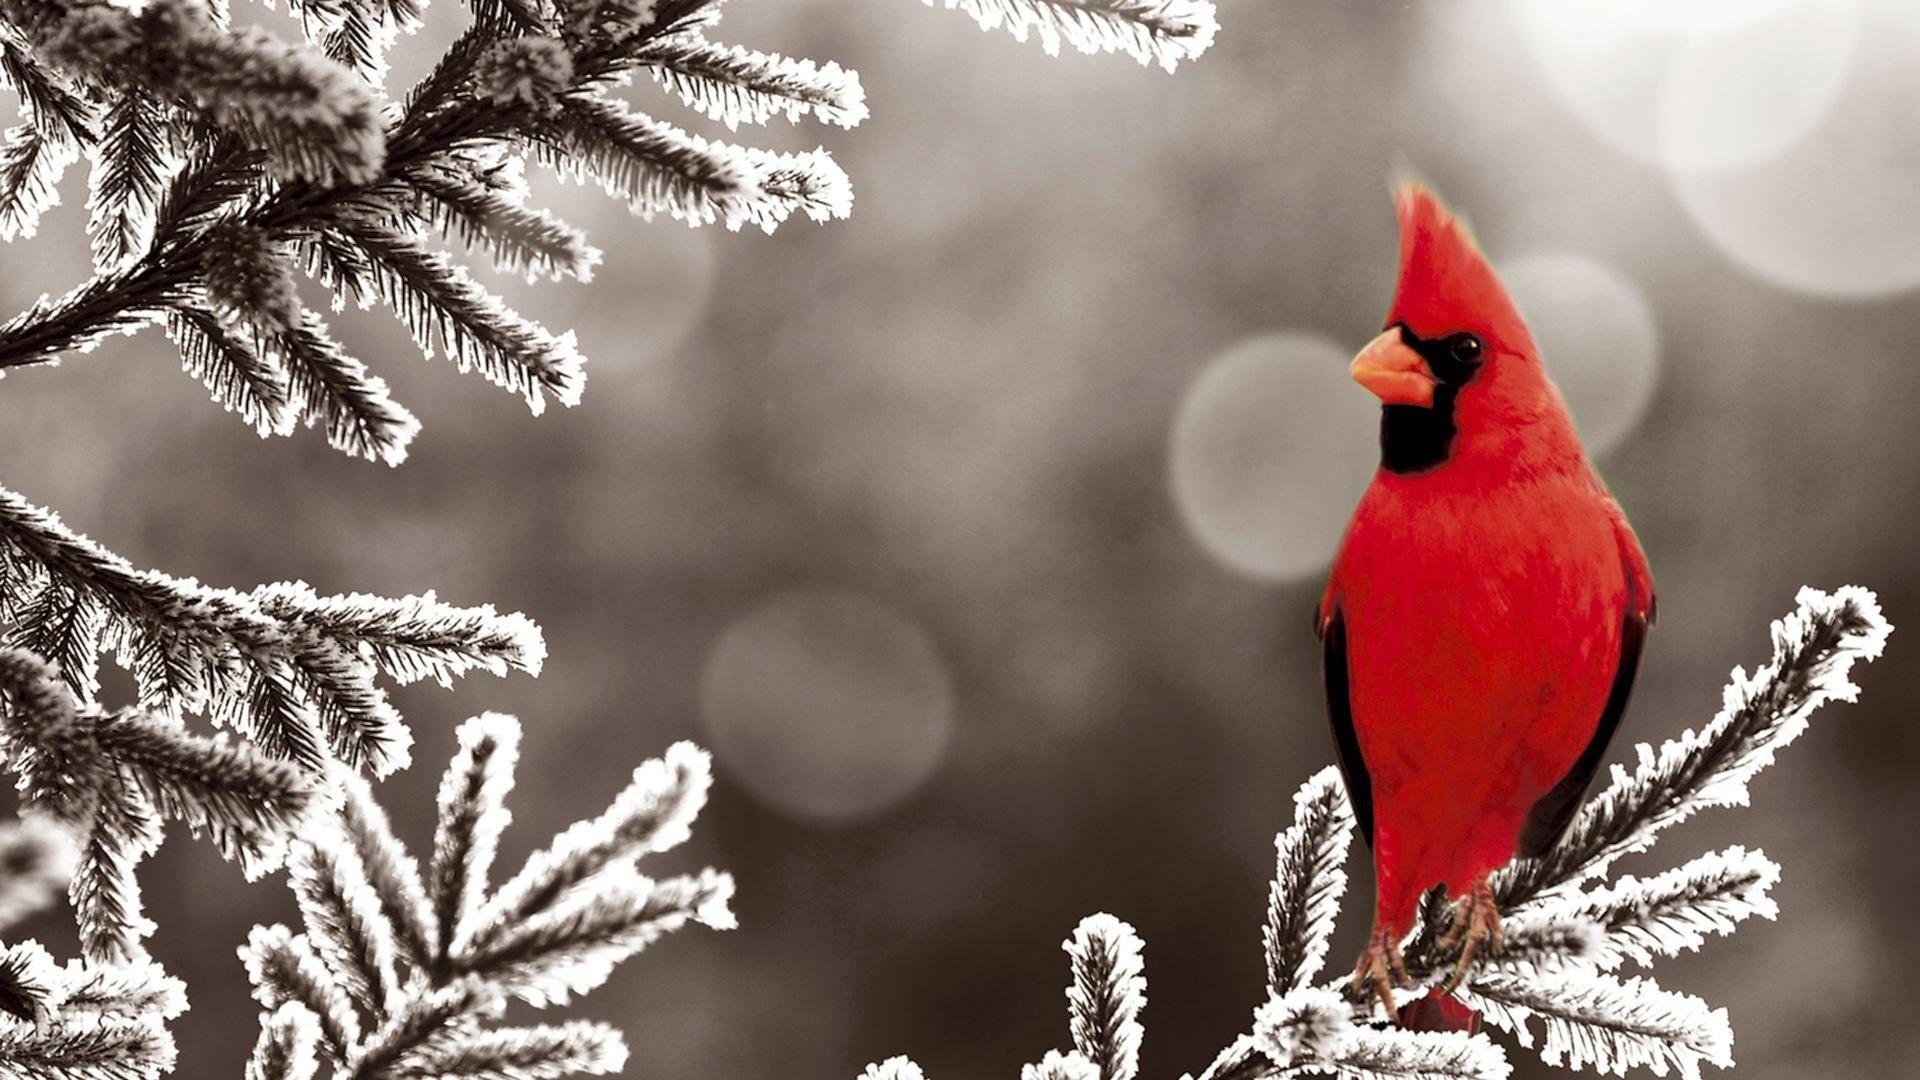 Red Cardinal 1080p Hd Wallpaper Birds Oiseaux